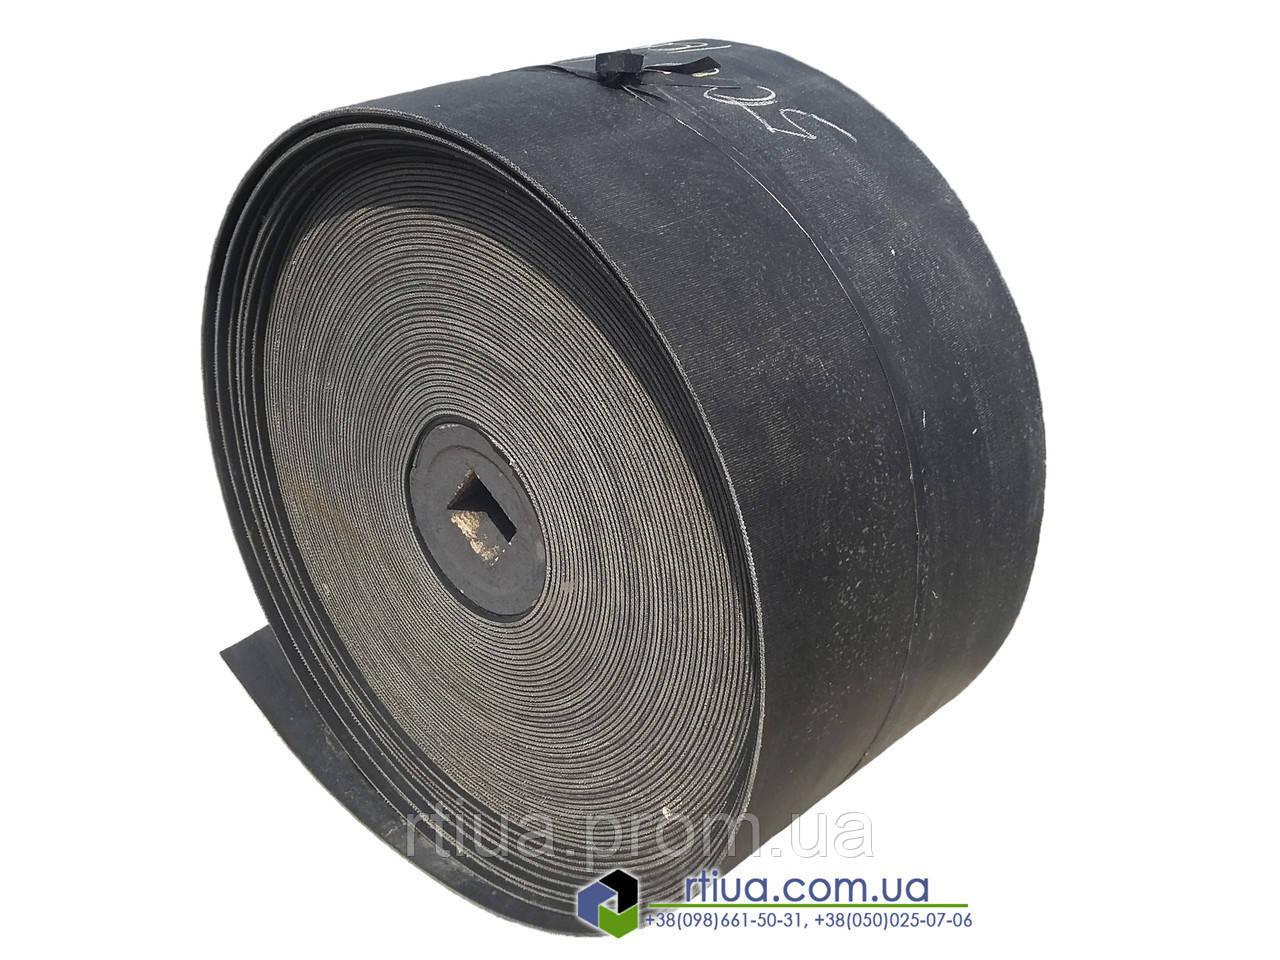 Конвейерная лента 125х3 мм